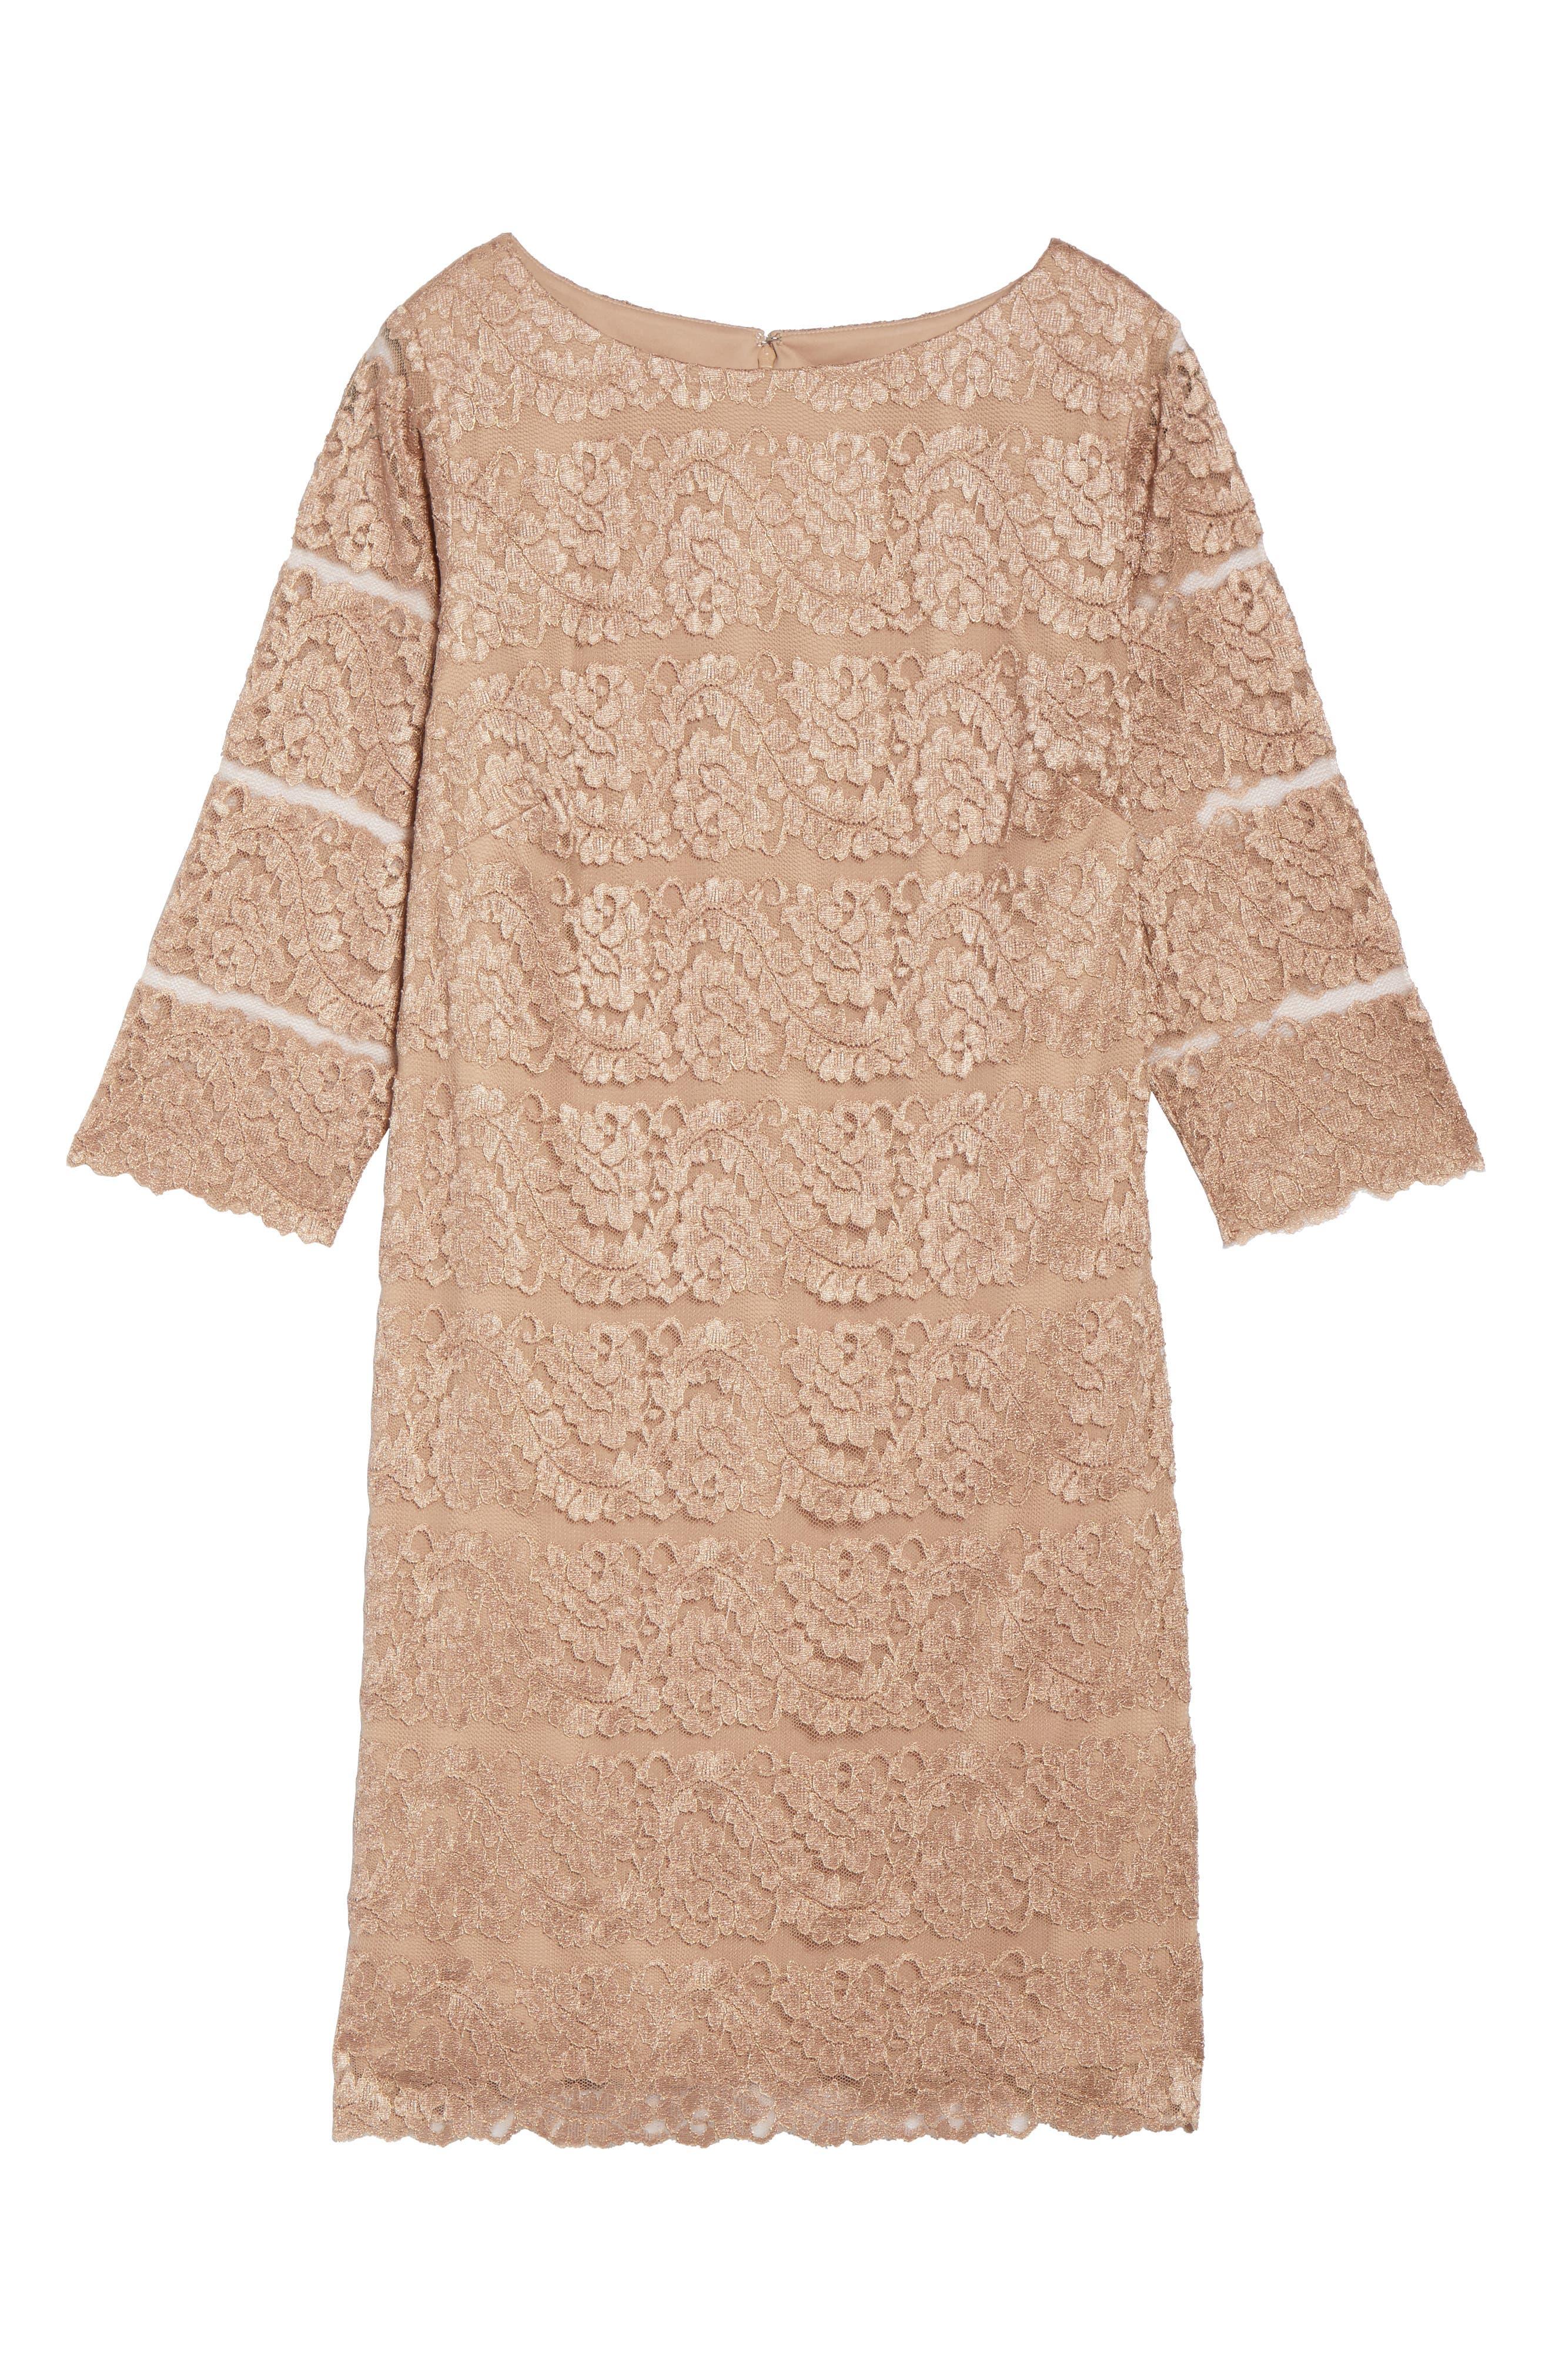 Lace Shift Dress,                             Alternate thumbnail 6, color,                             258